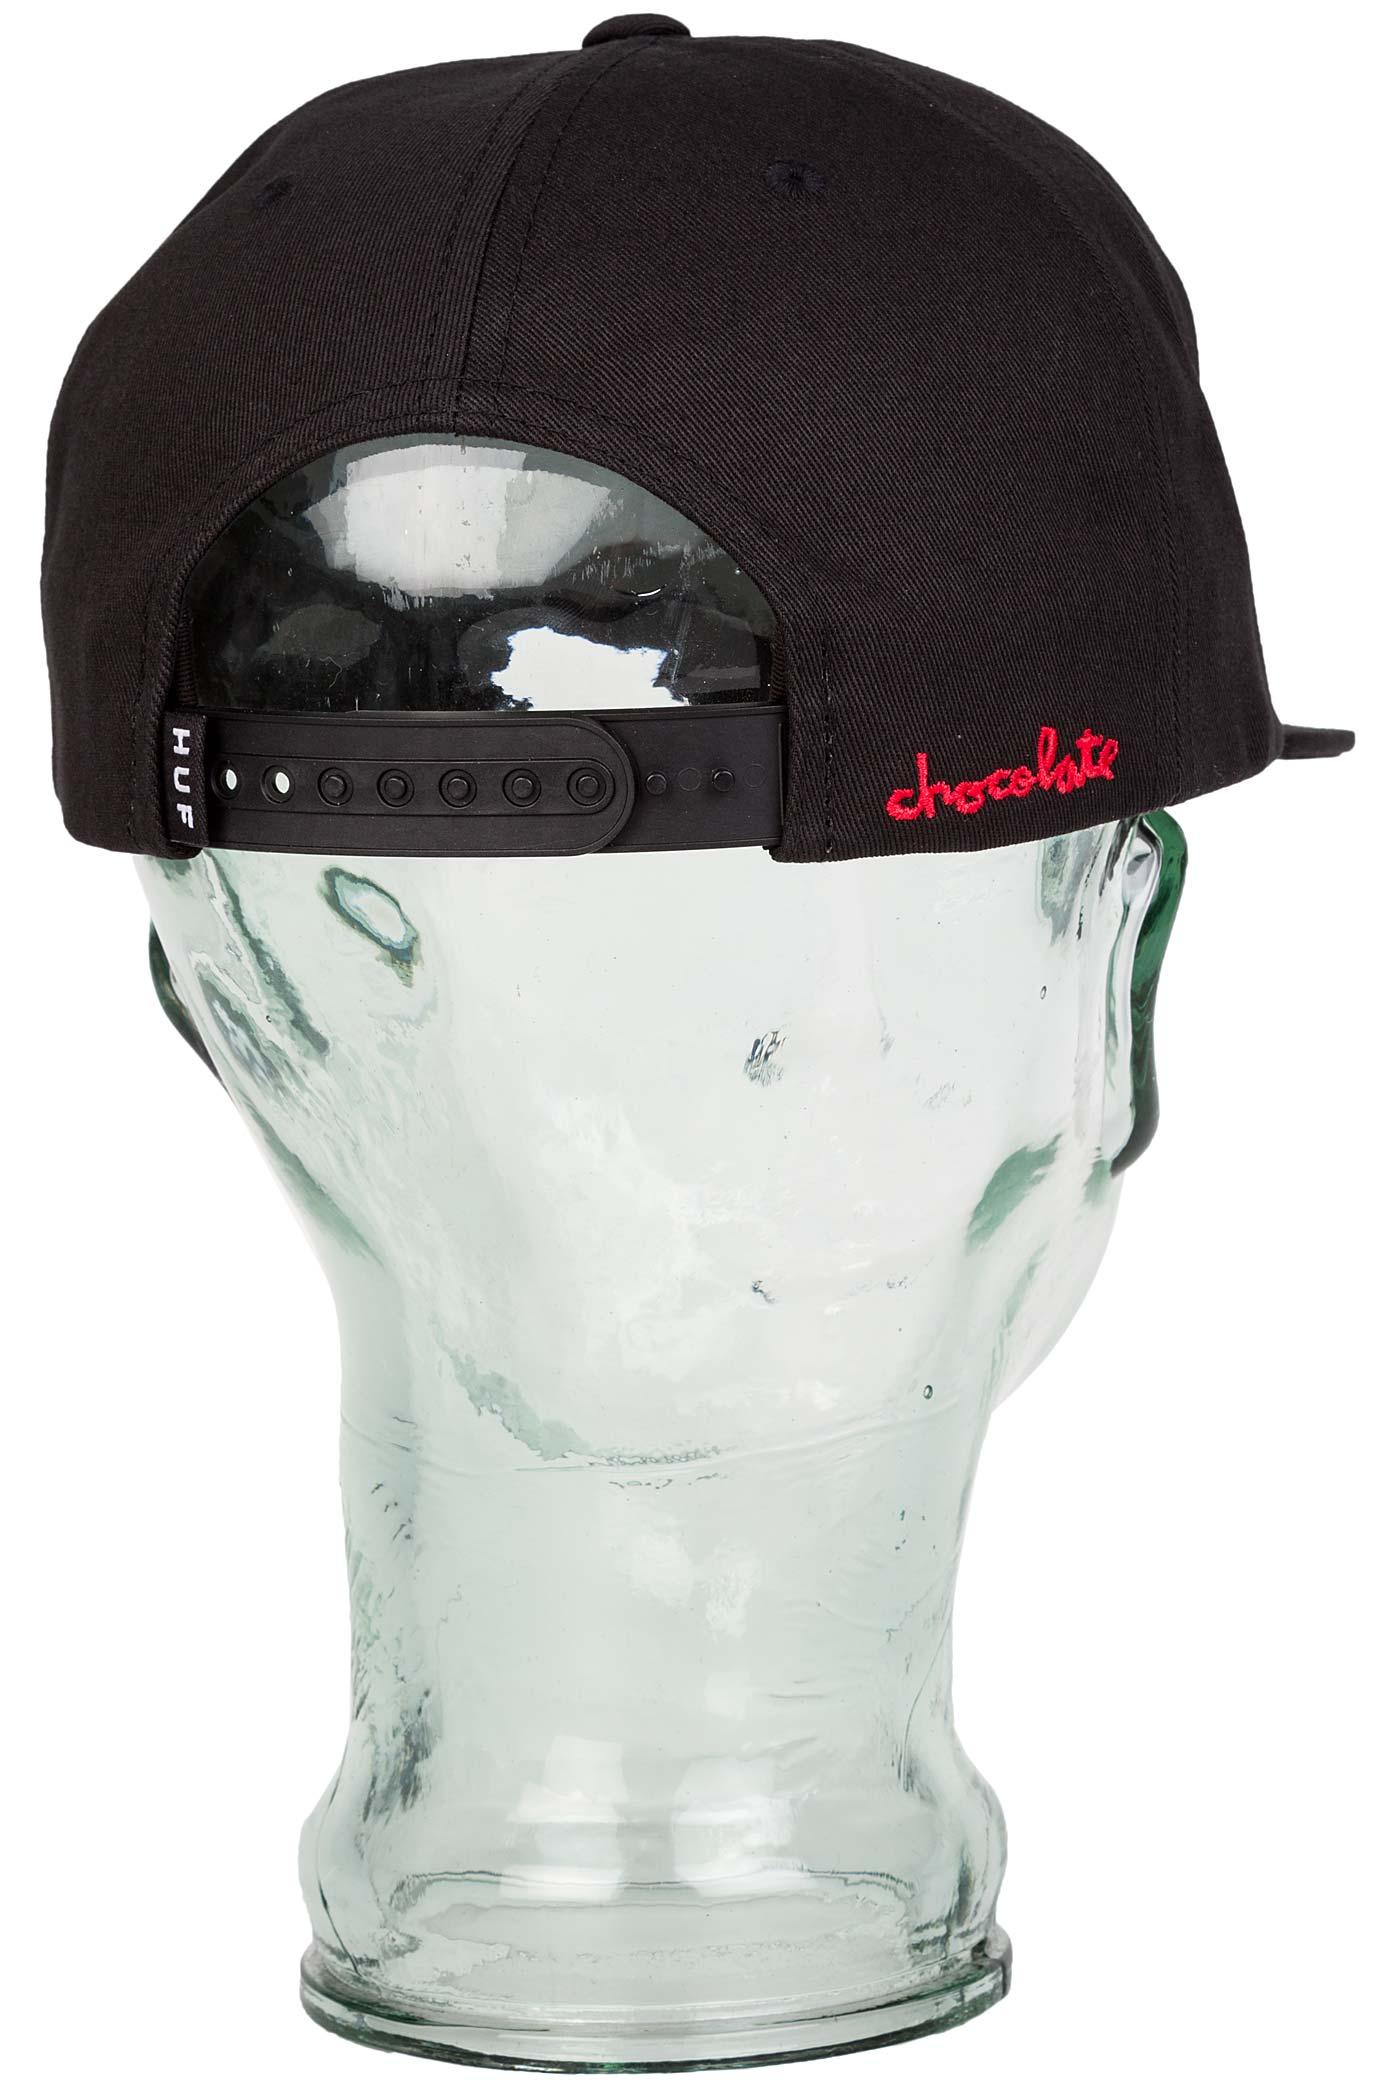 HUF x Chocolate Snapback Cap (black) buy at skatedeluxe 30d5fe4bdca